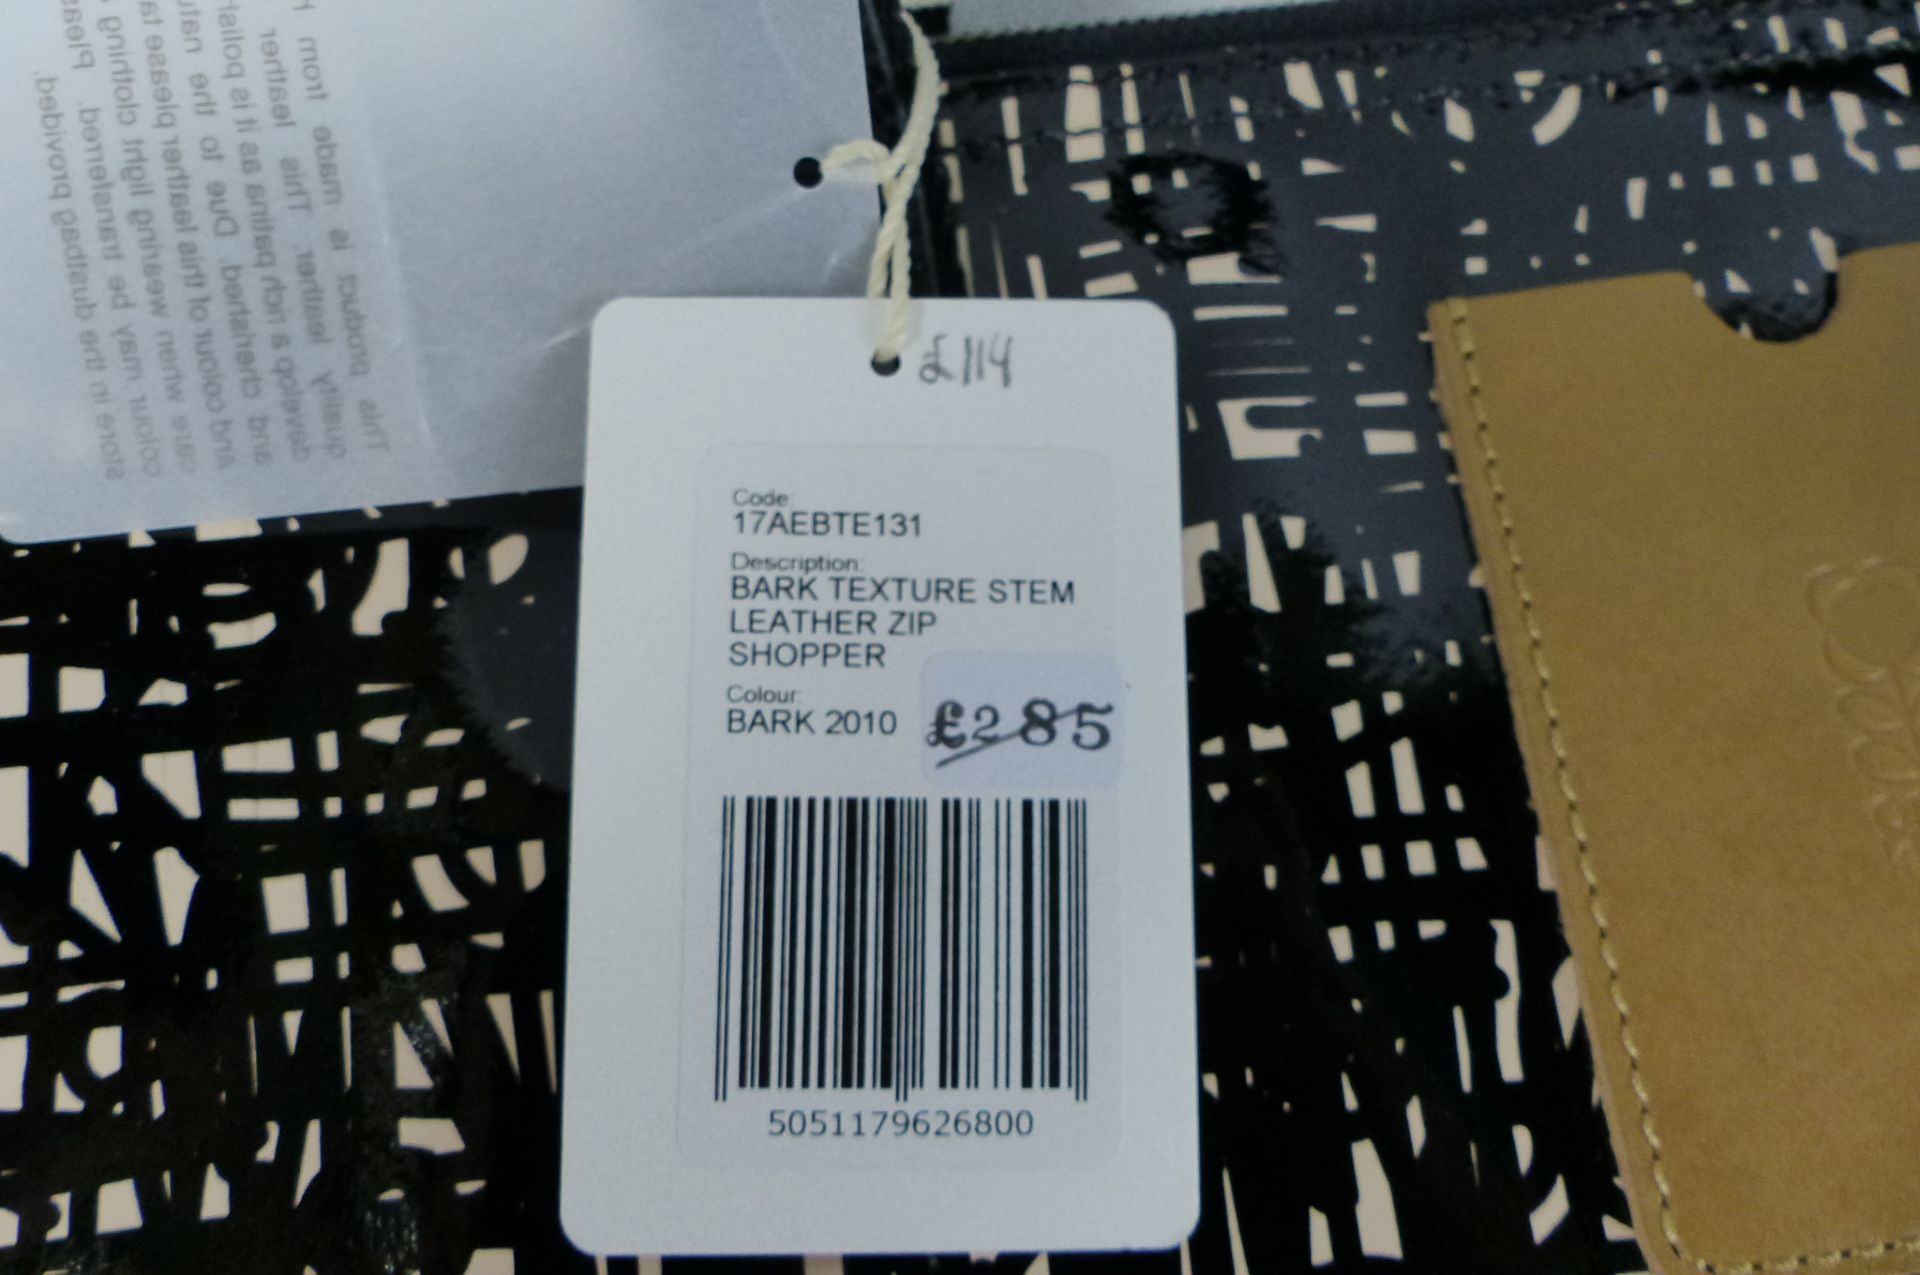 Orla Kiely Textured Bark Leather Shopper Bag Black - Image 2 of 2